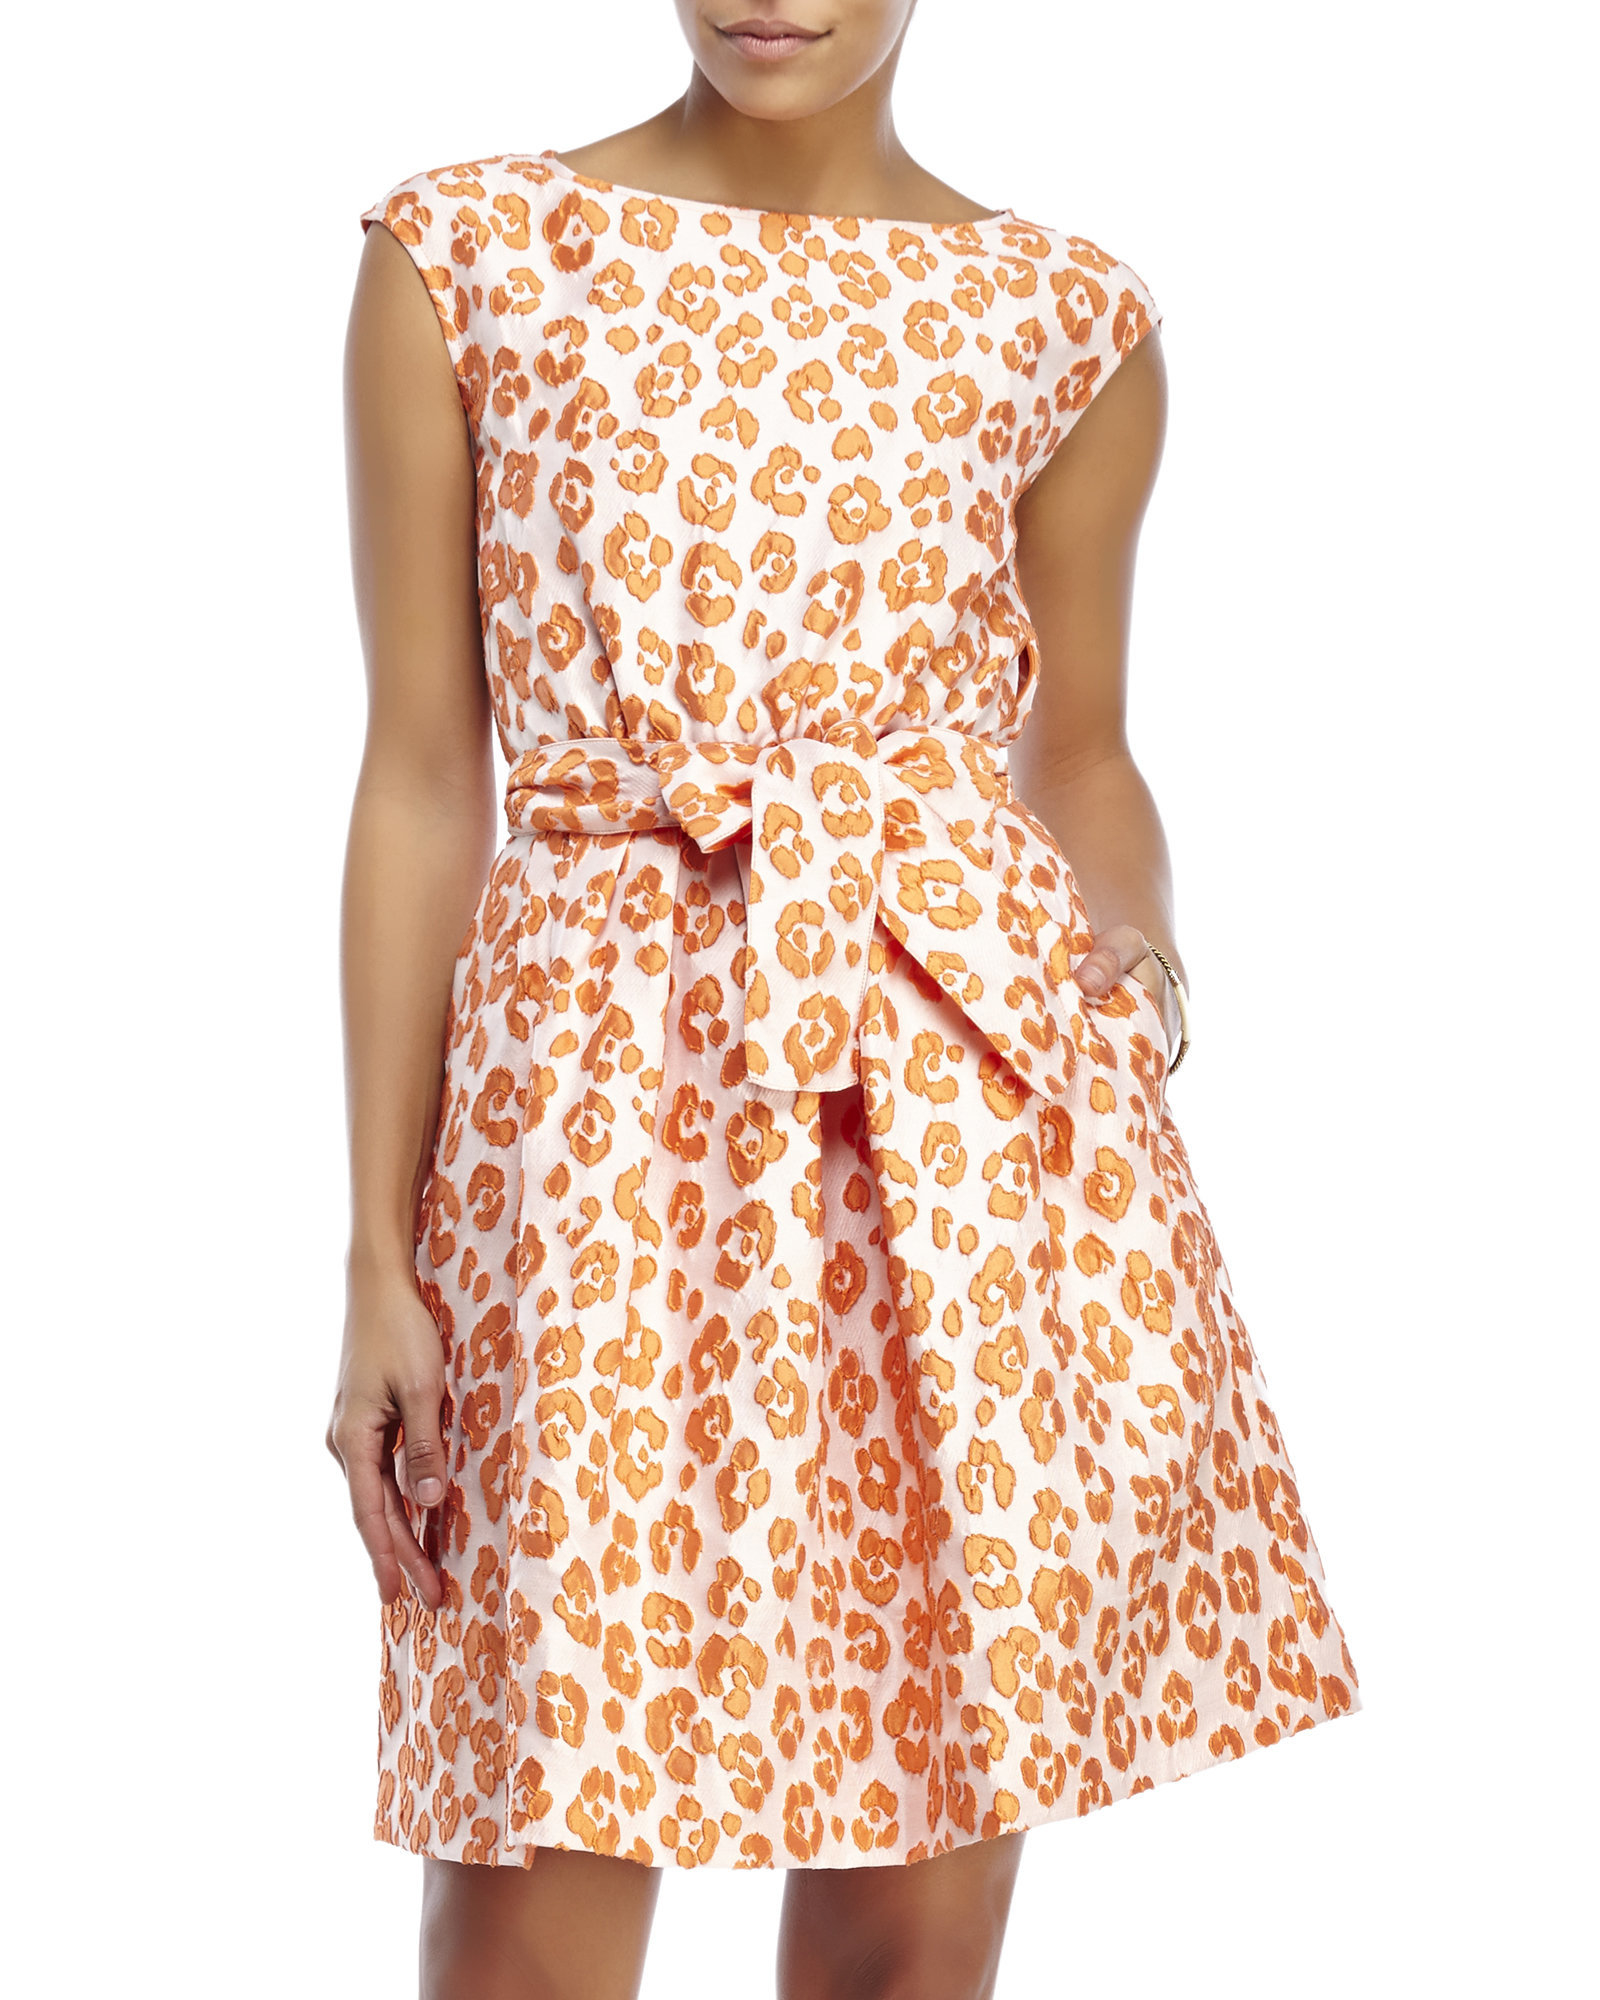 724b802d6bc6 Boutique Moschino Jacquard Leopard Print Dress in Orange - Lyst